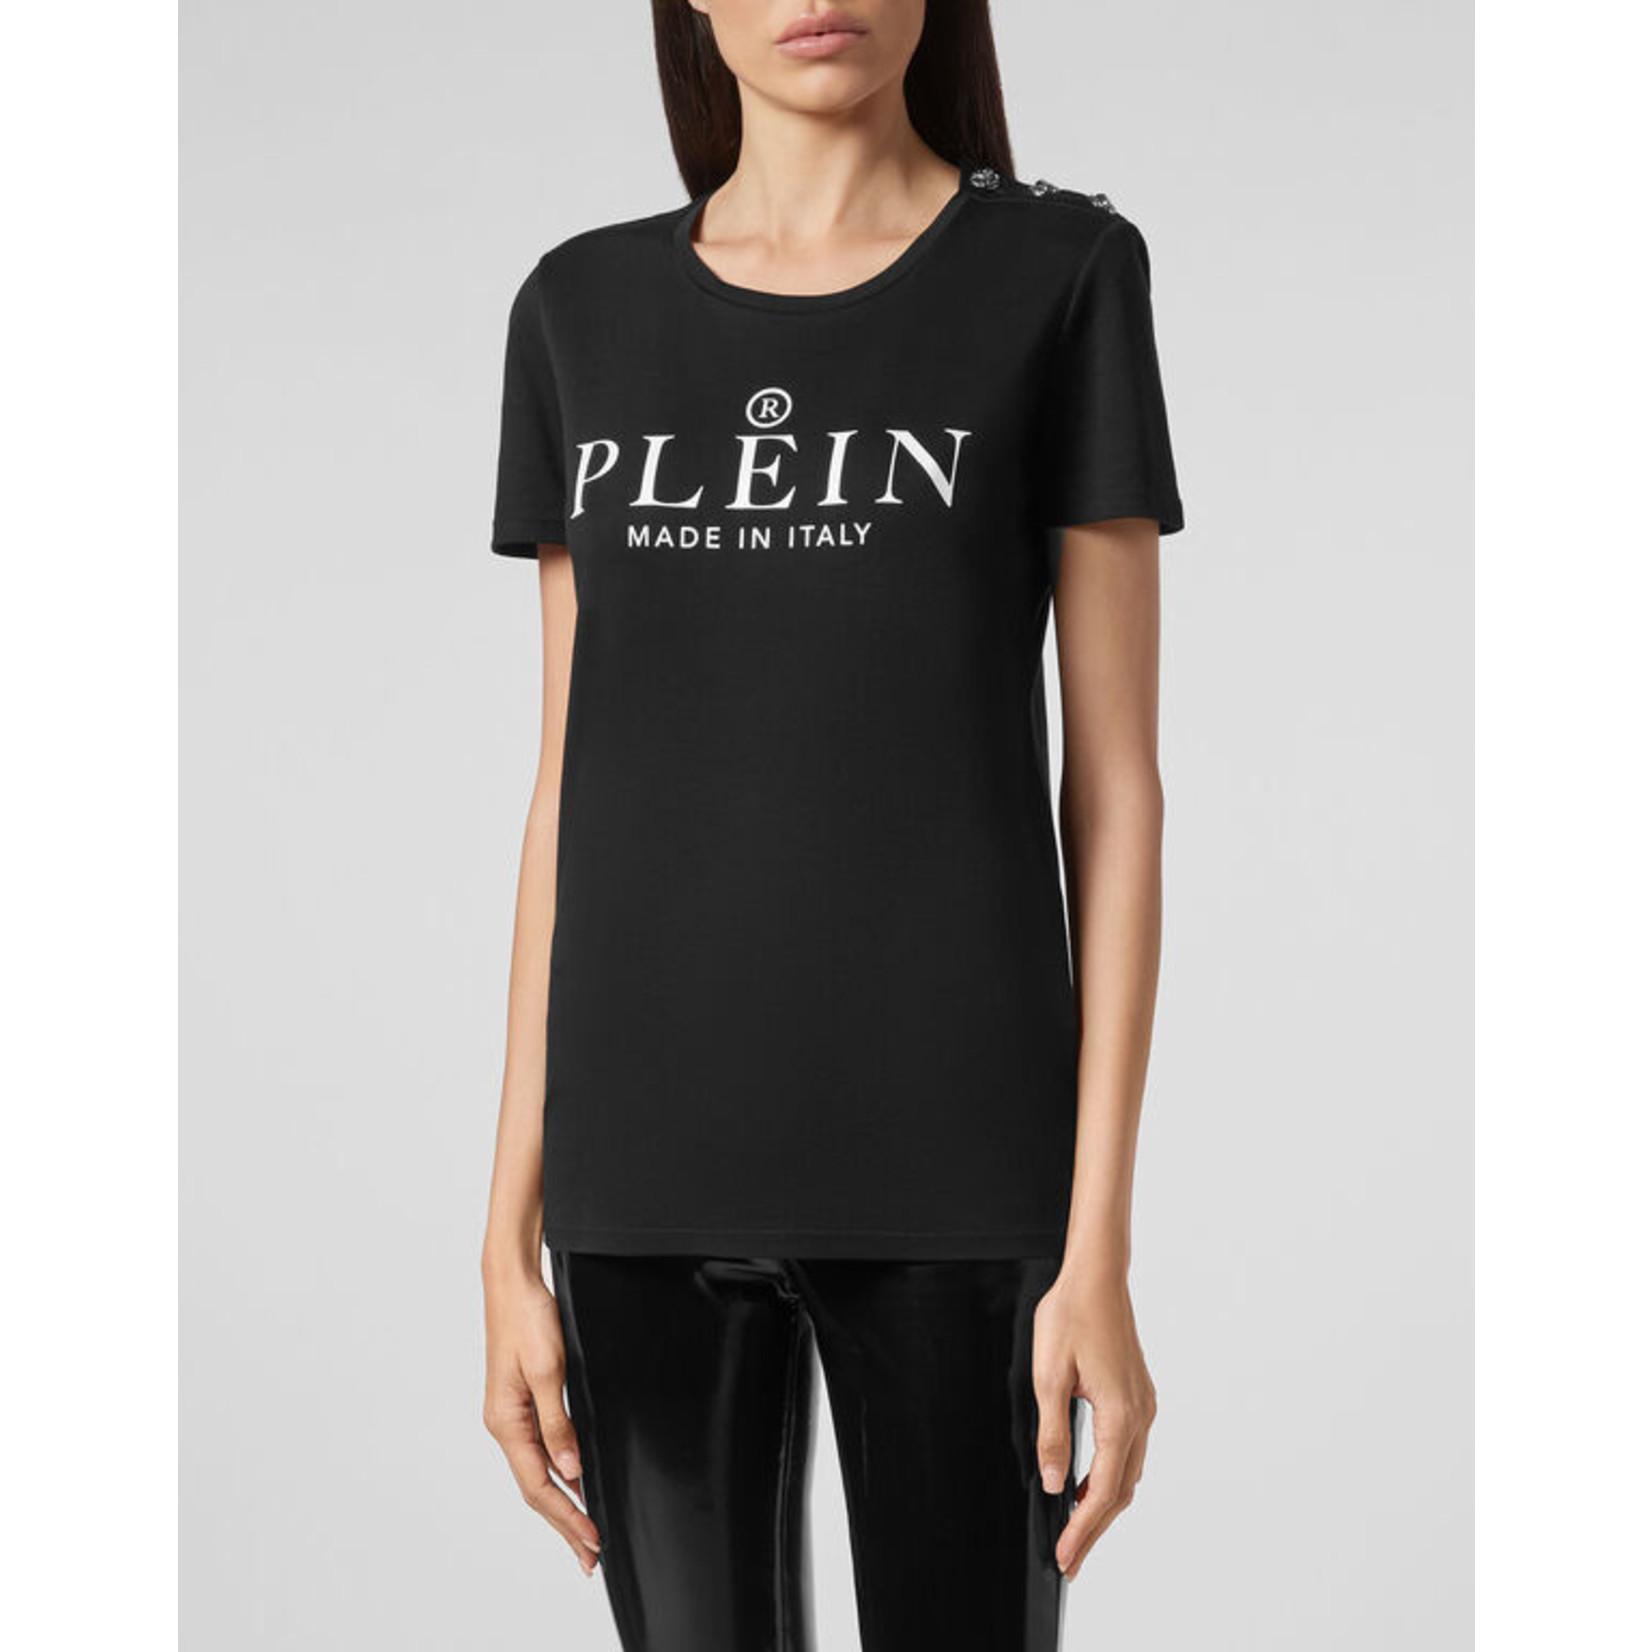 Philipp Plein T-Shirt 42469